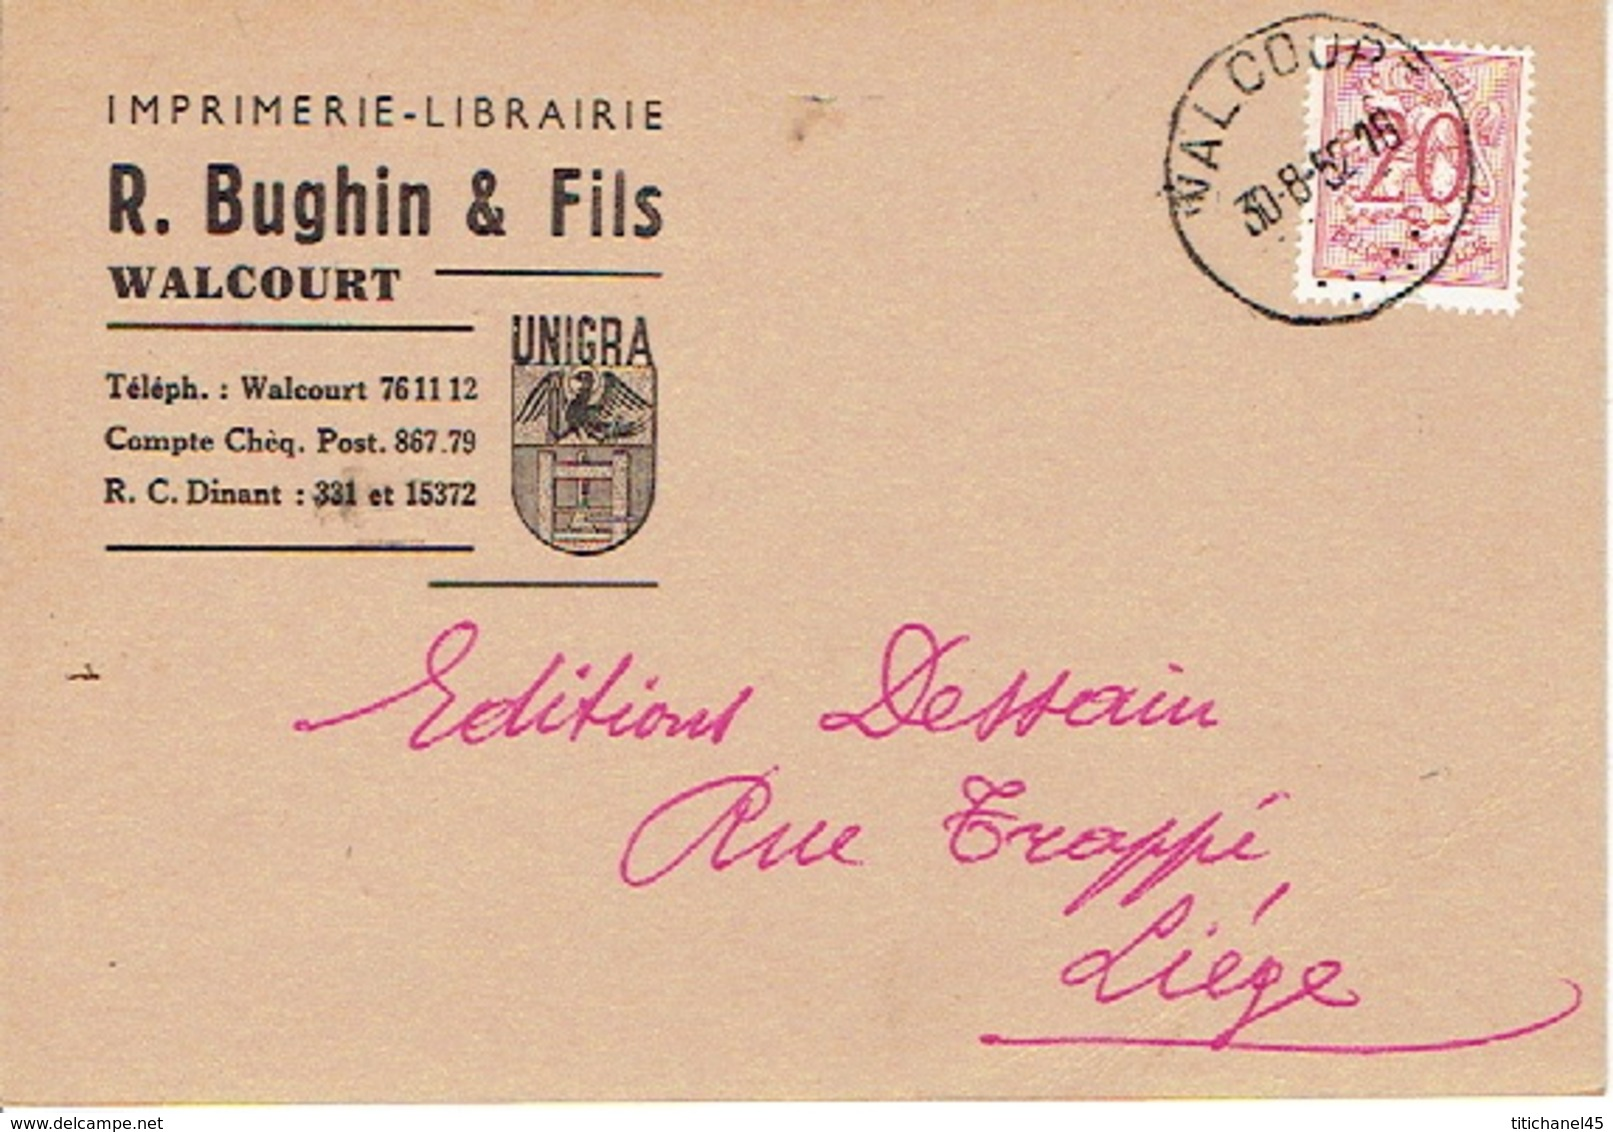 CP Publicitaire WALCOURT 1952 - R. BUGHIN & Fils - Imprimerie - Librairie - Walcourt